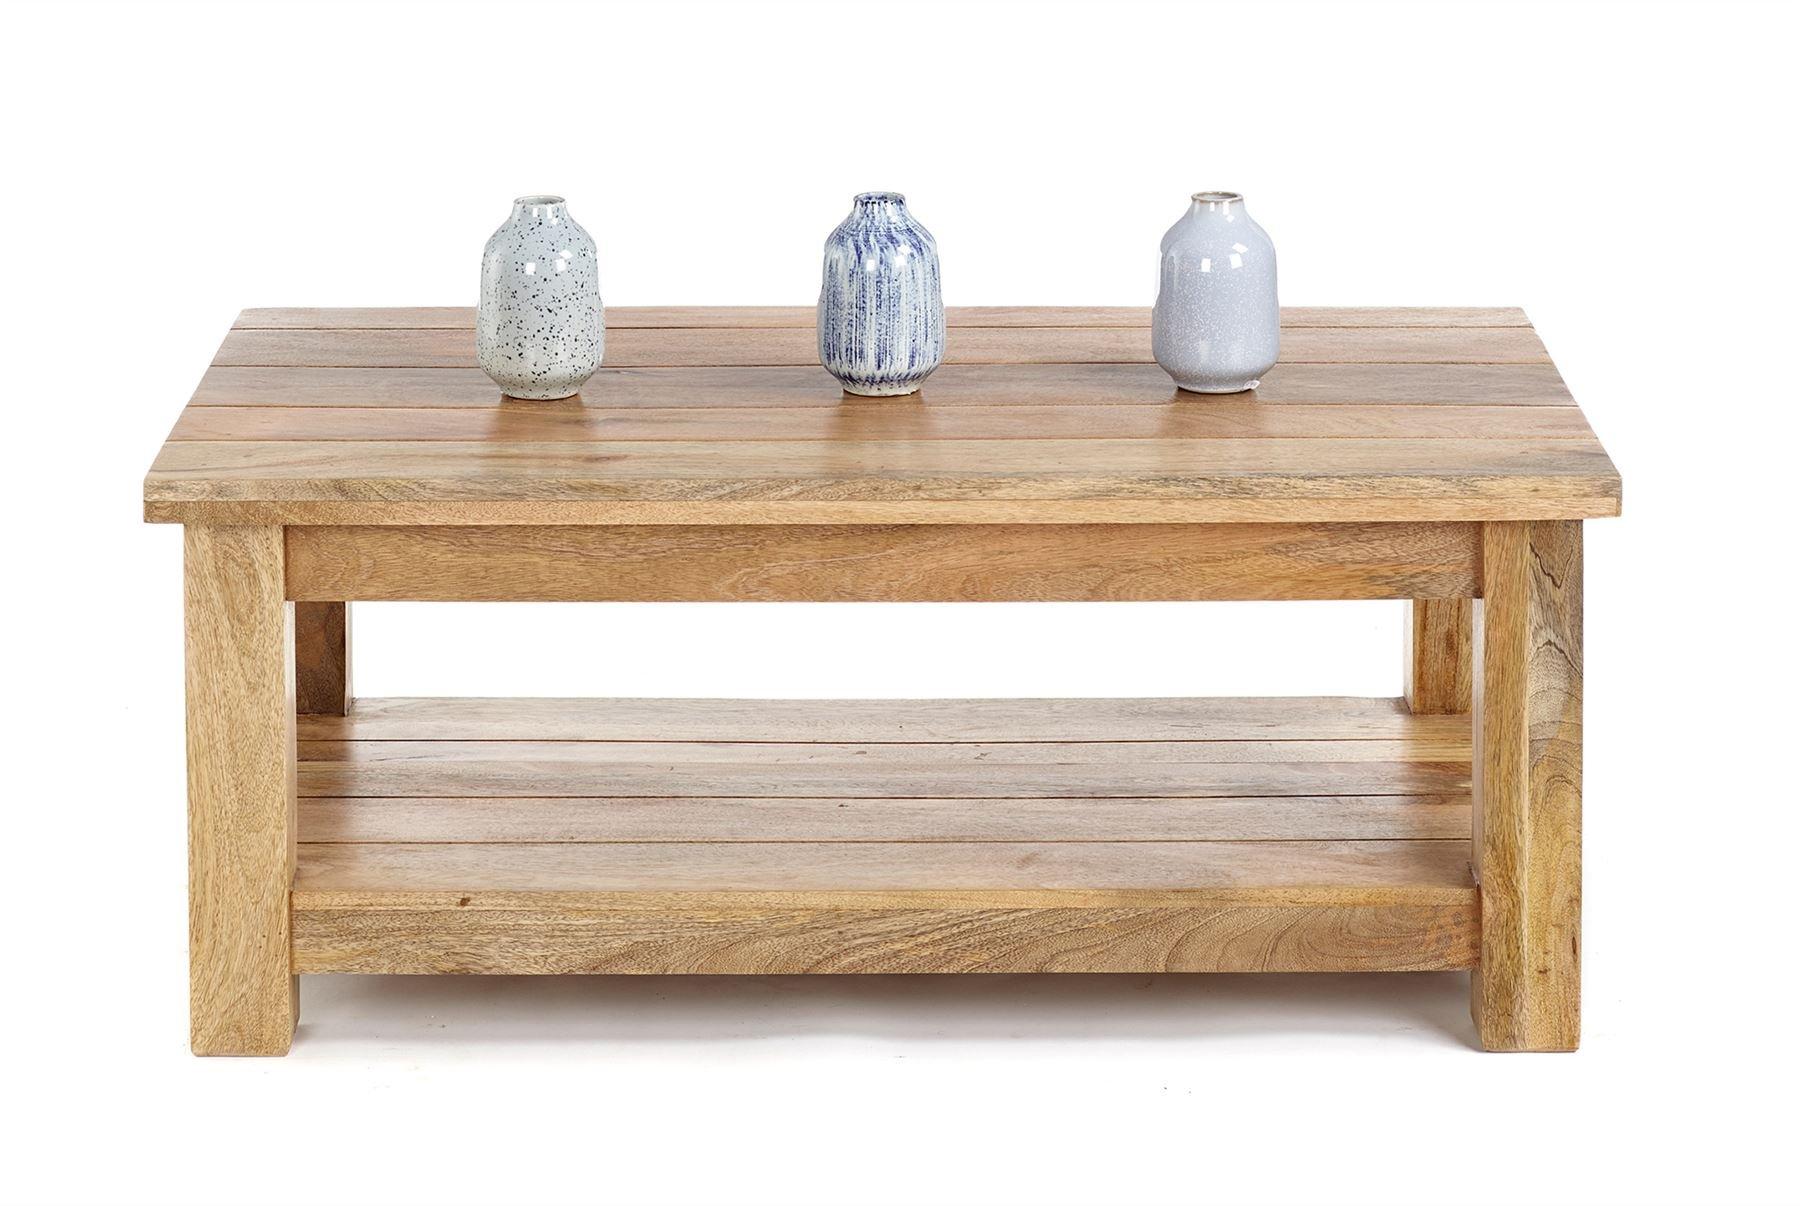 Elm Home And Garden Dorset Farmhouse Soild Hard Wood Coffee Table Shelf  Natural Light Oak Finish